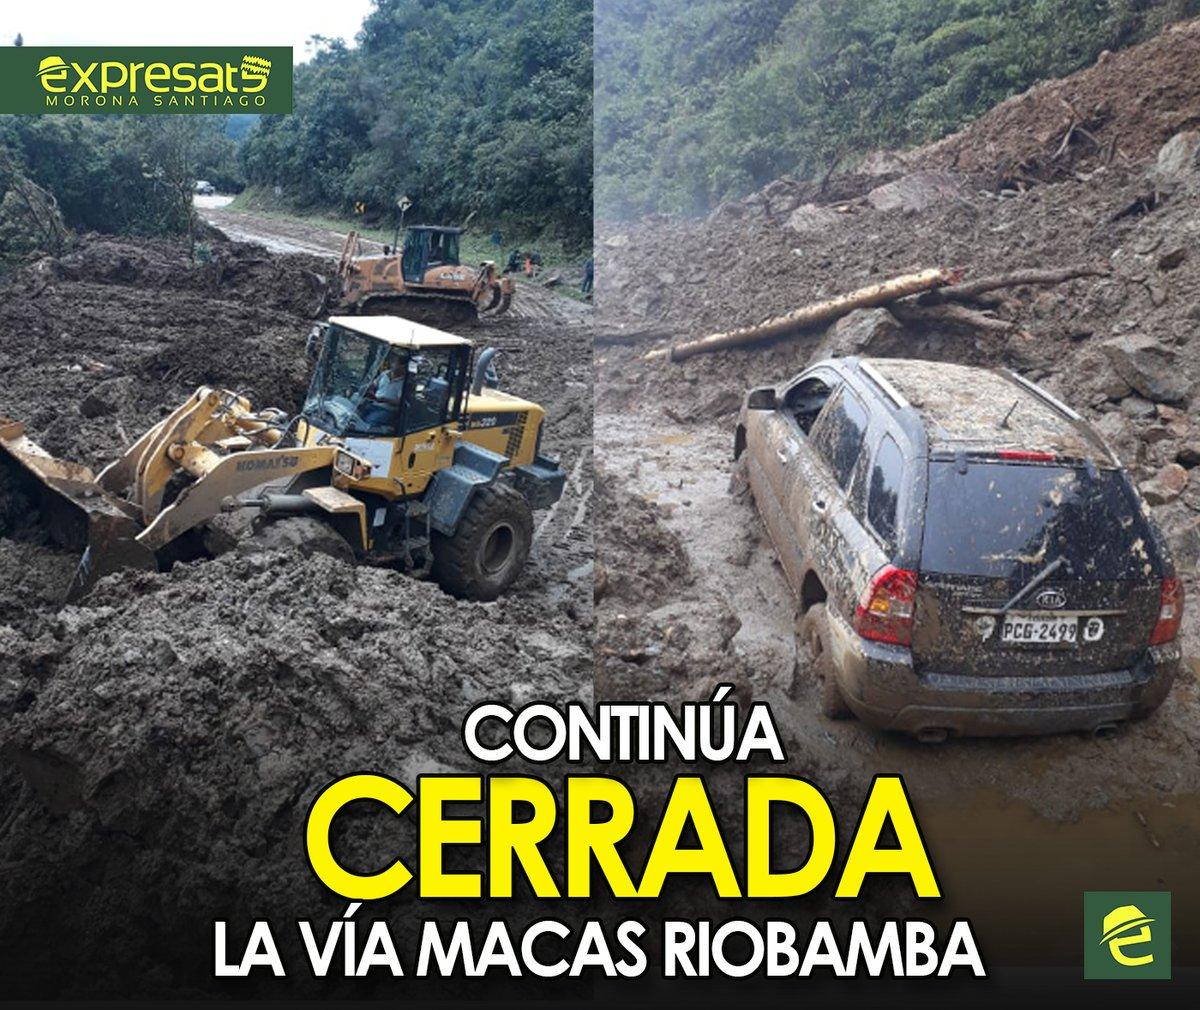 INPC Ecuador